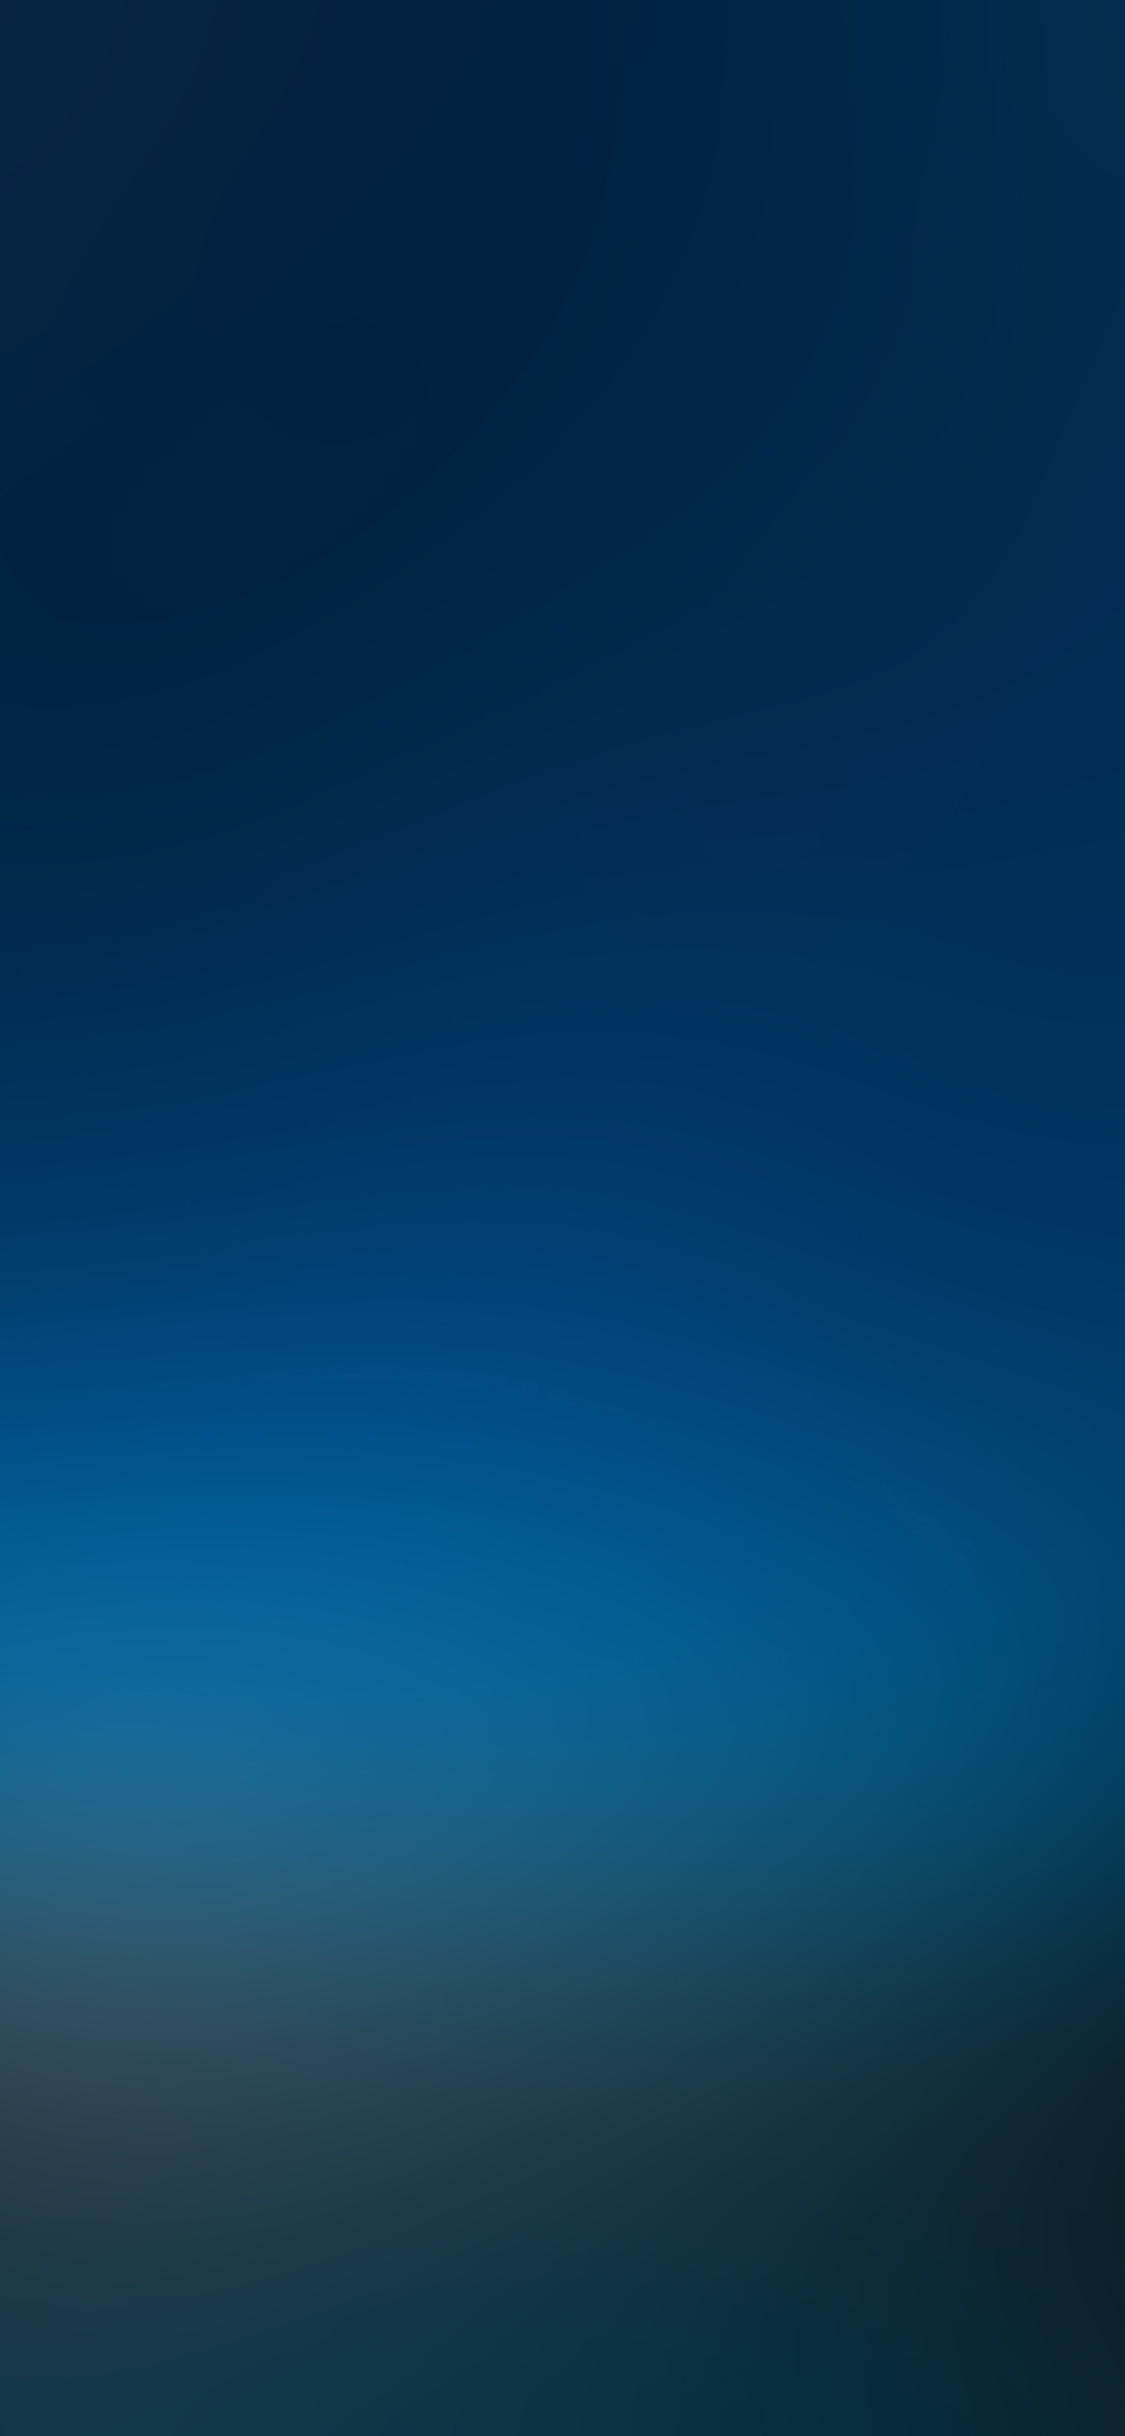 iPhoneXpapers.com-Apple-iPhone-wallpaper-sc23-let-it-go-blur